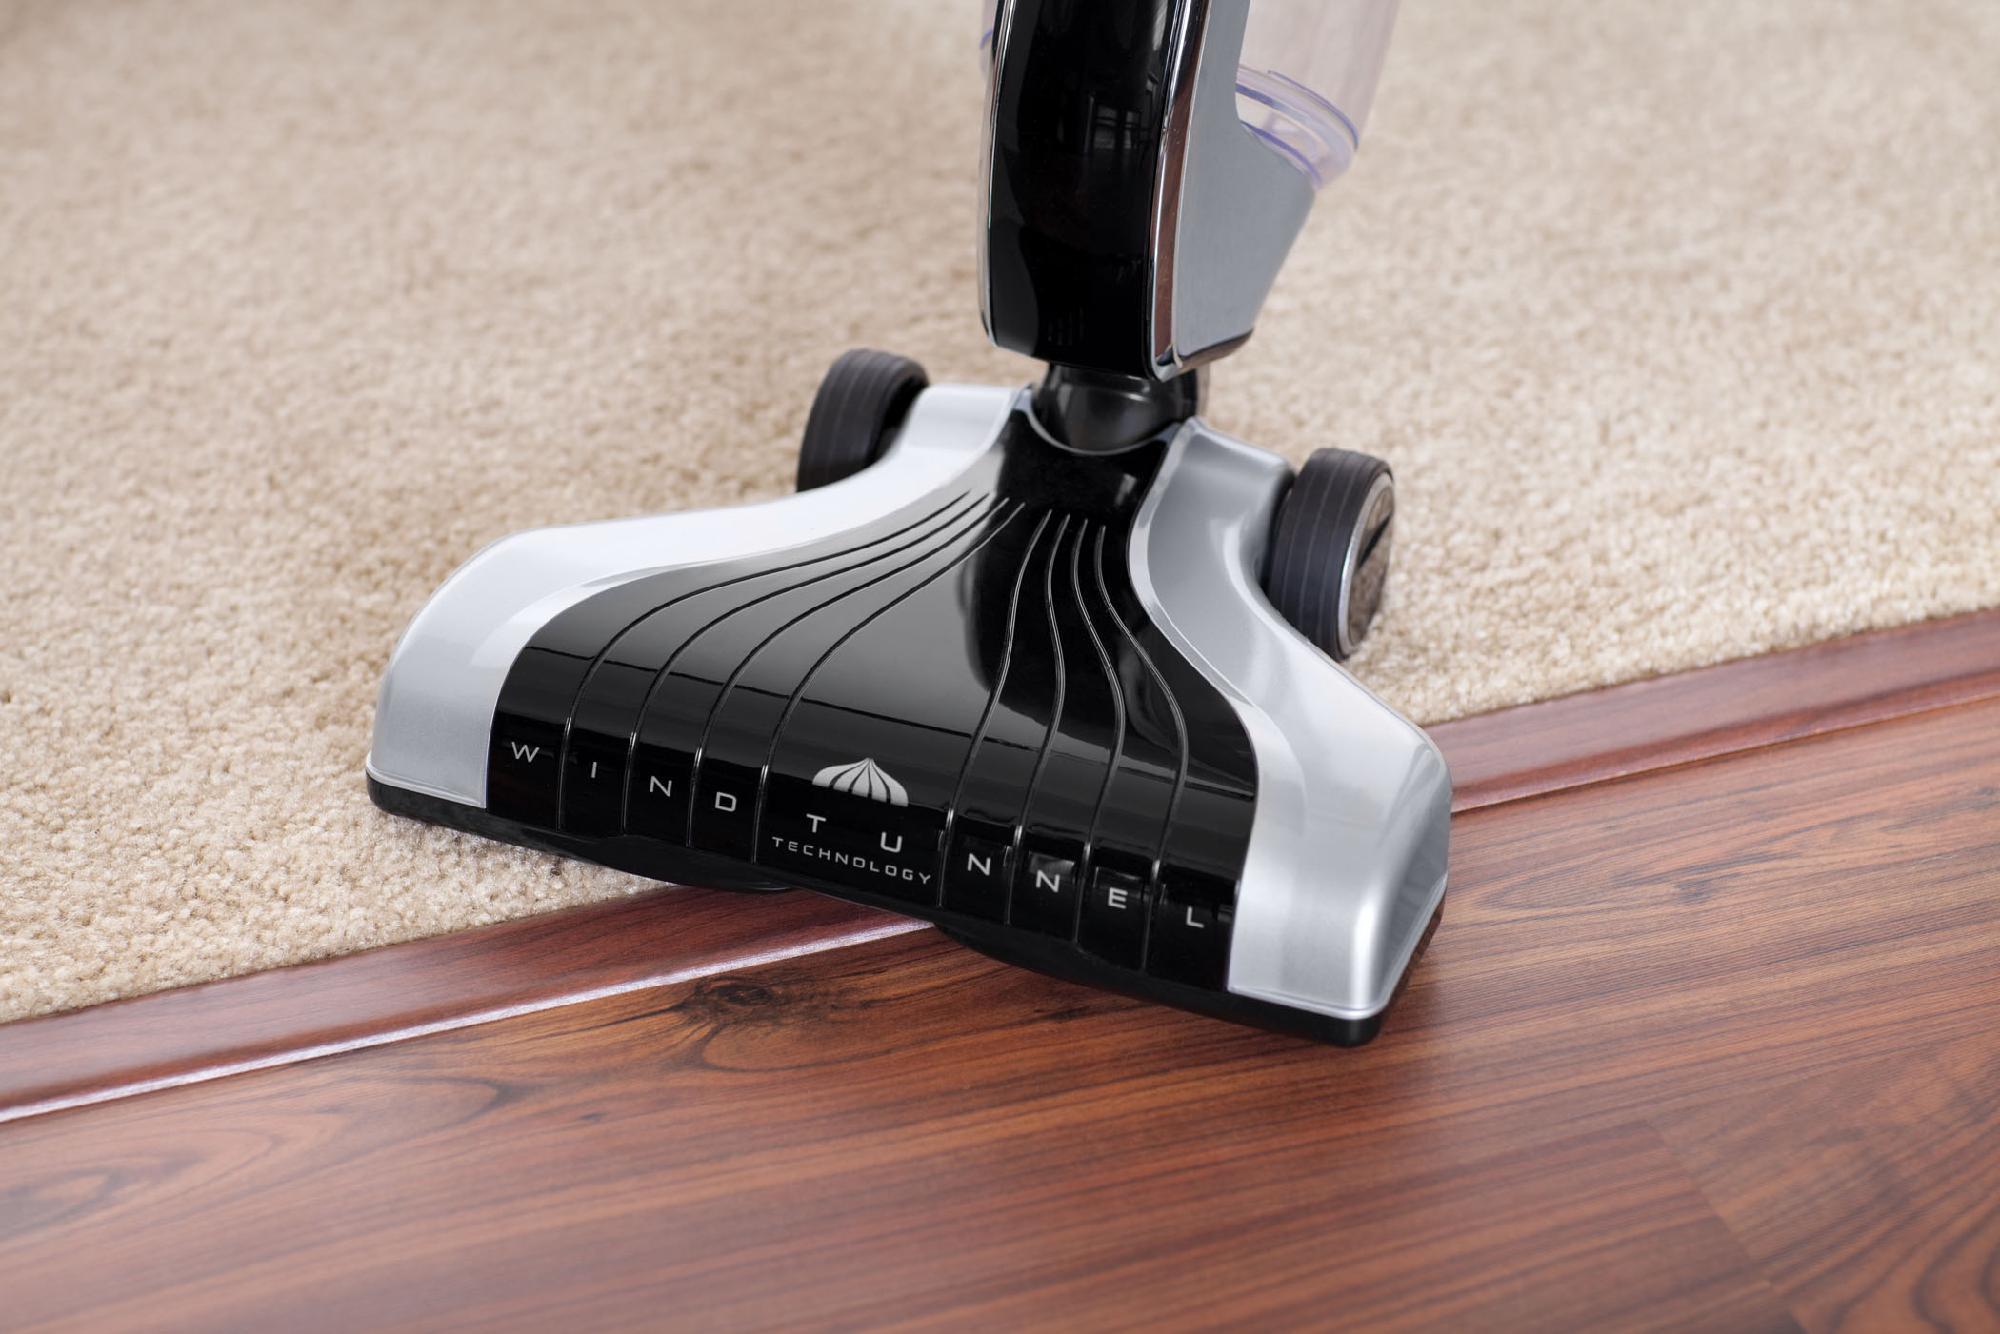 Hoover BH50010 Platinum Collection LiNX Cordless Stick Vacuum